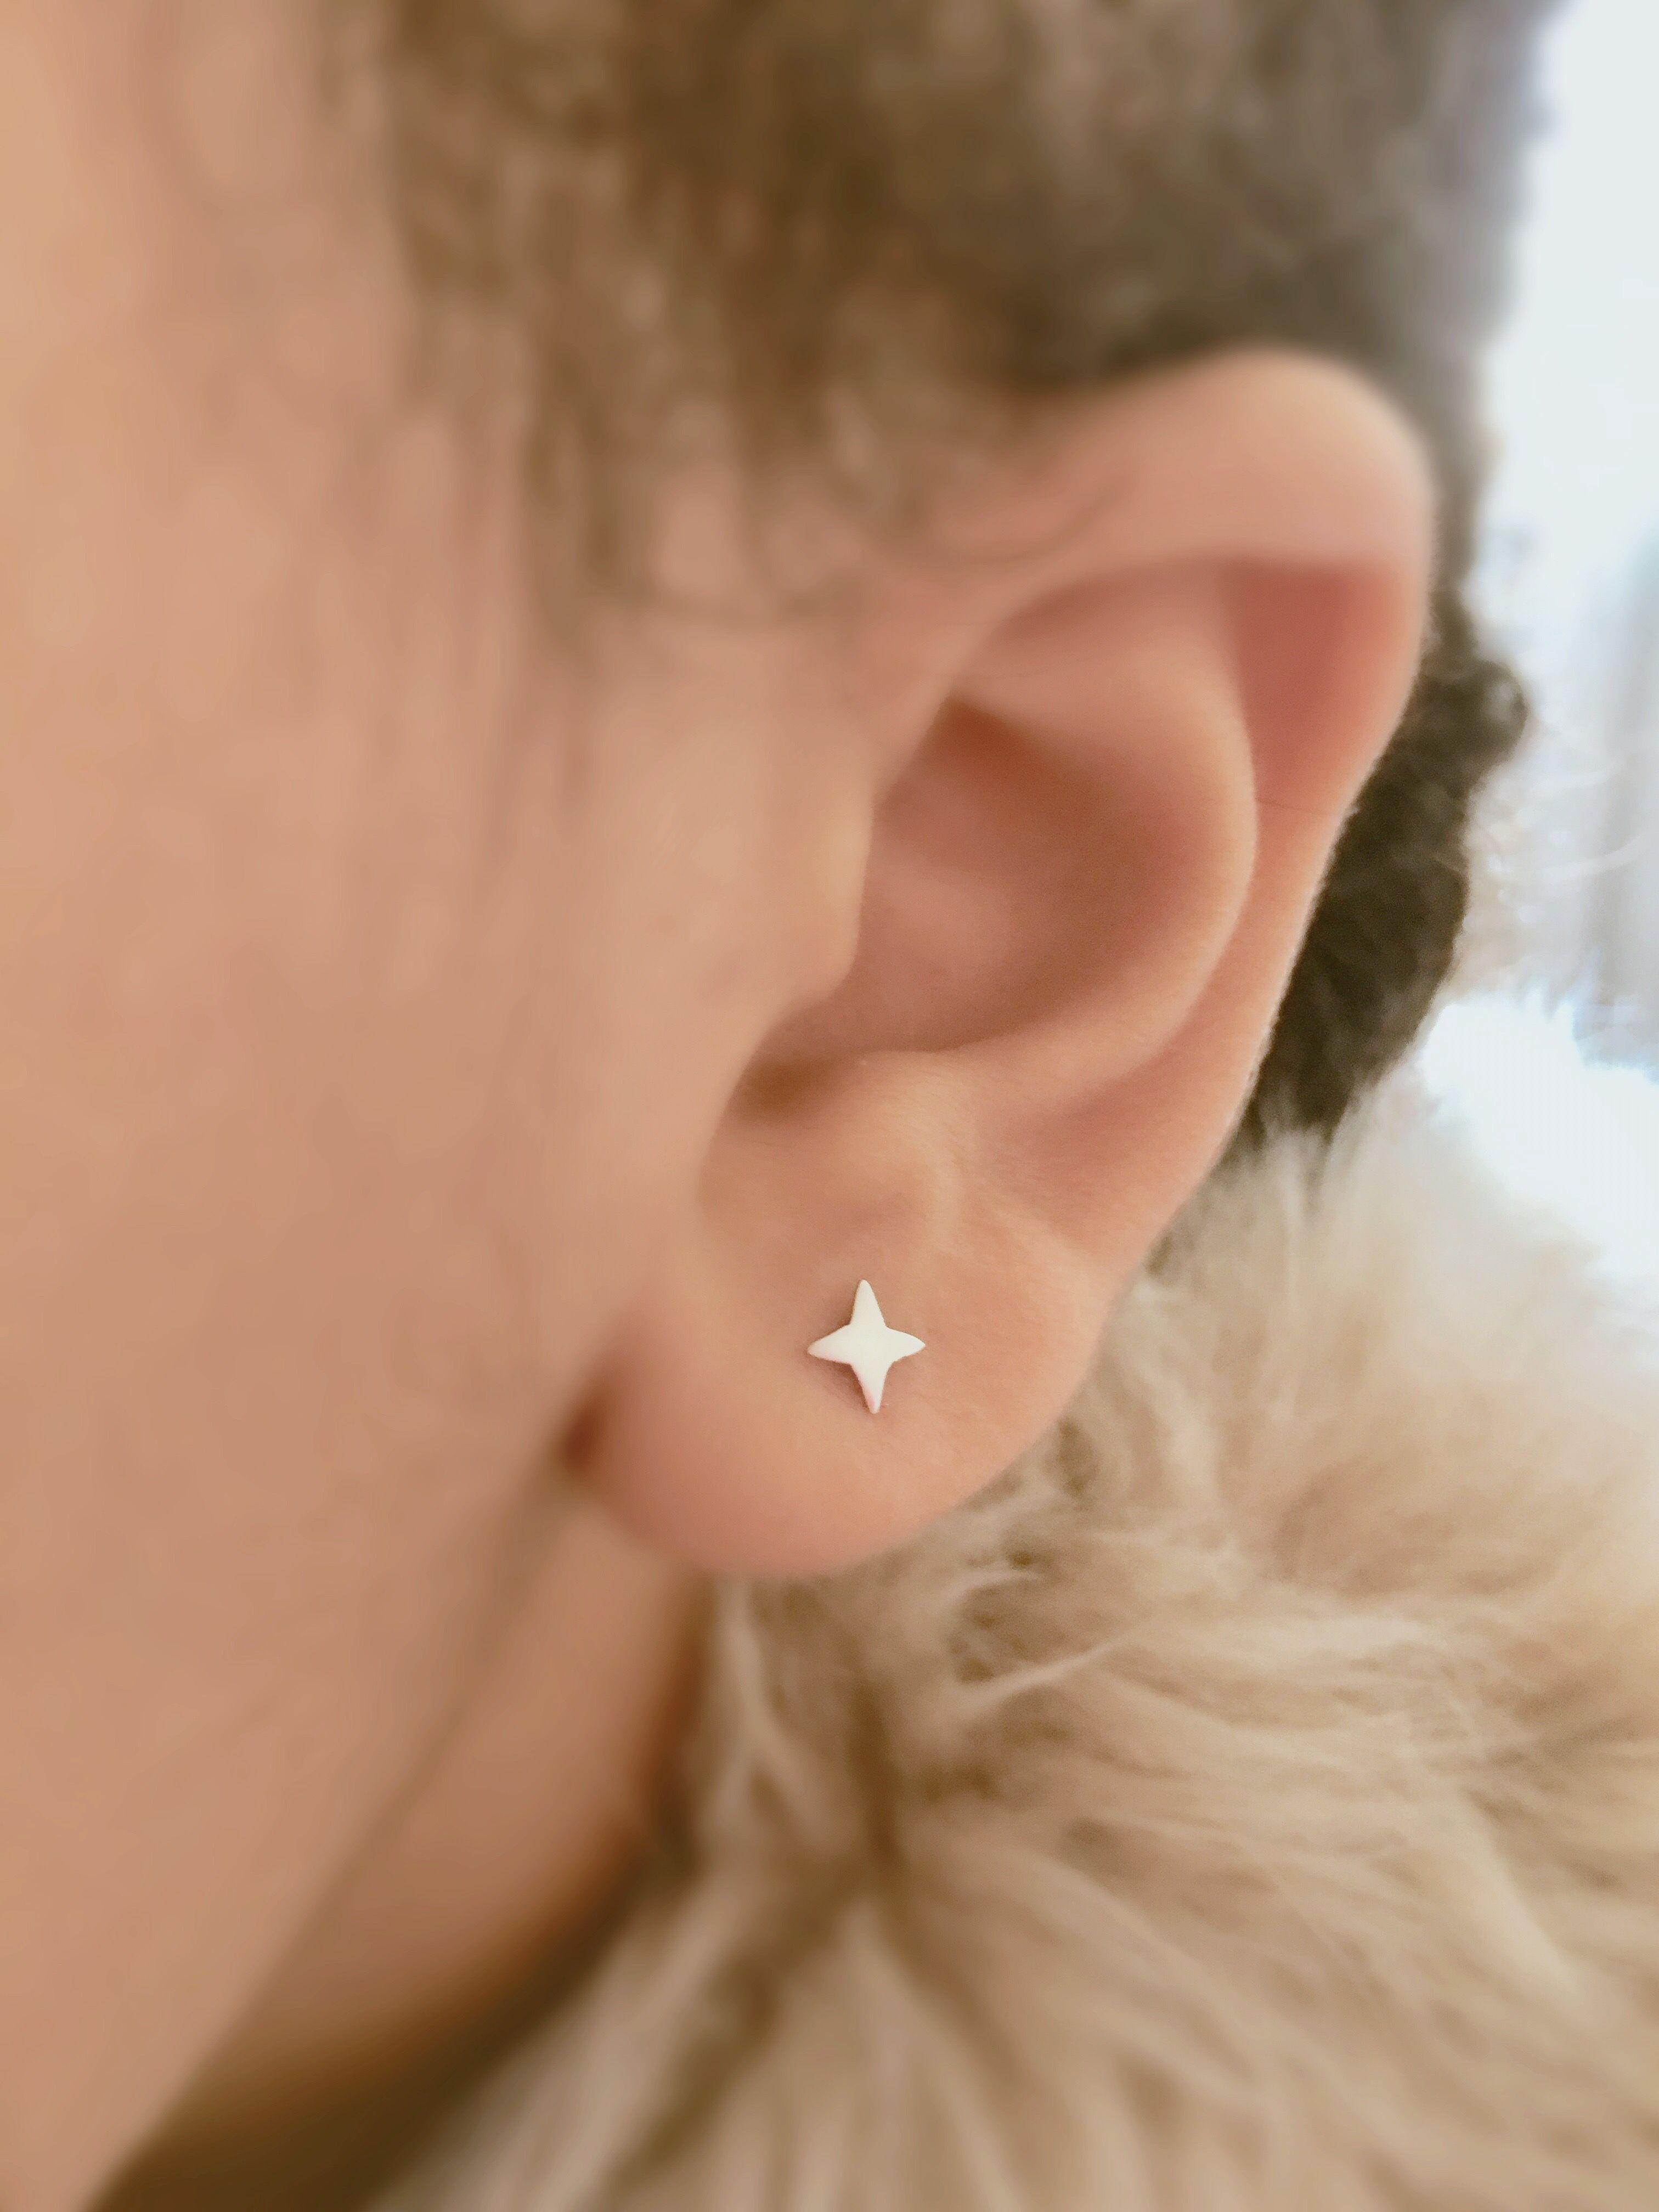 Nose piercing over 50  estée  andJules  andJules  Pinterest